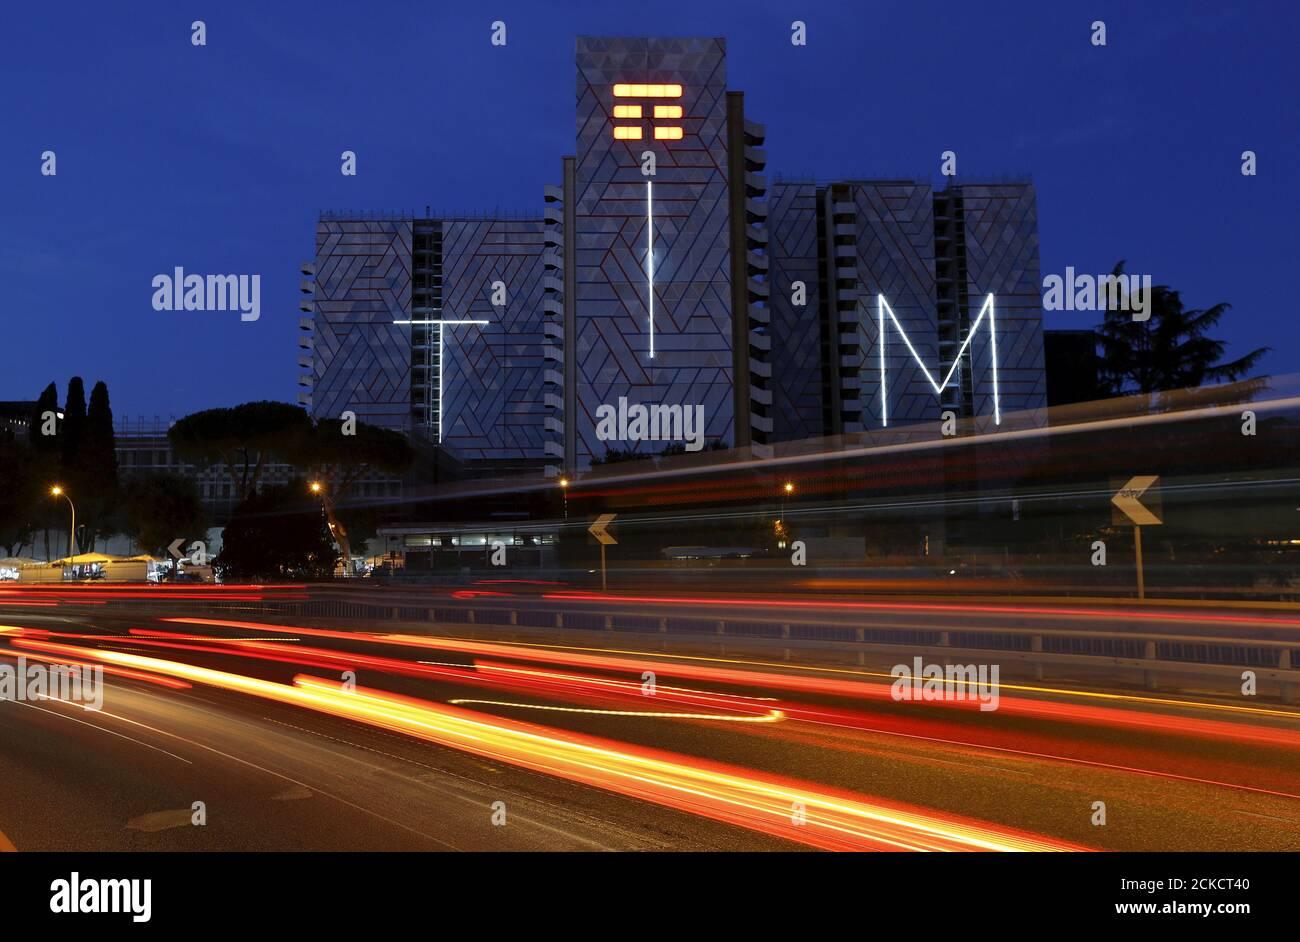 Telecom Italia Mobile Immagini E Fotos Stock Alamy